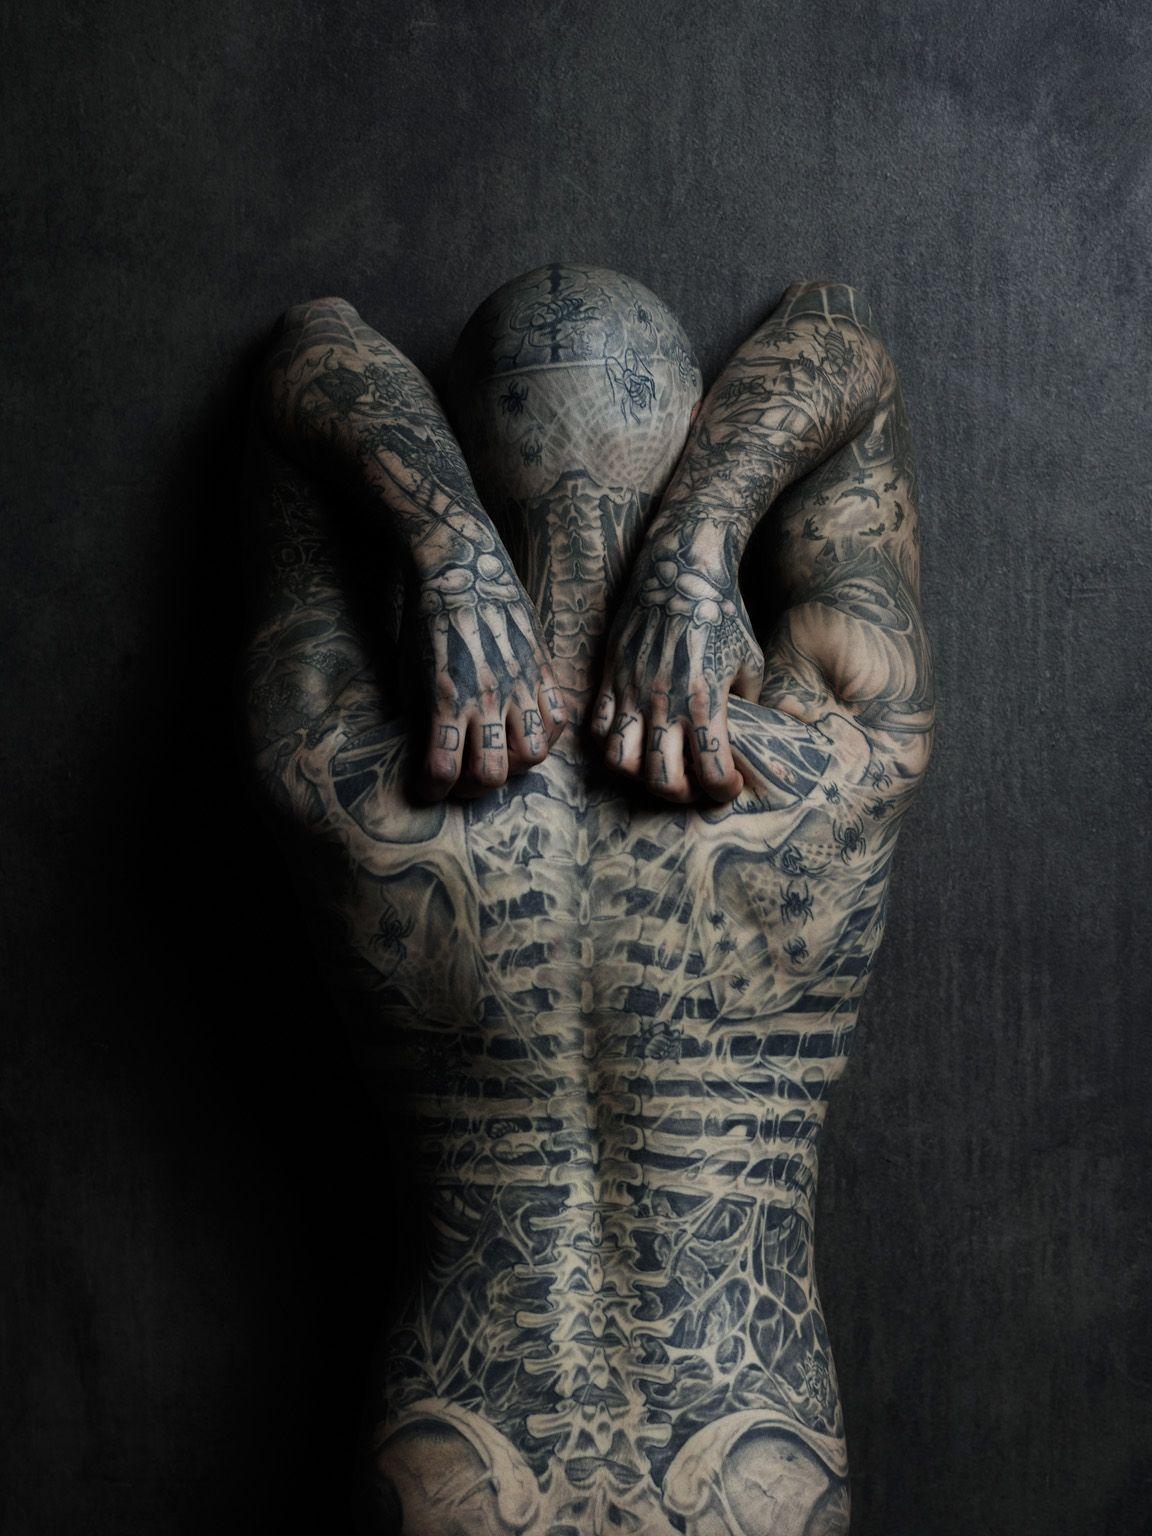 Tattoo ideas back piece rico the zombie  tattoo  tattoos  pinterest  rick genest zombie